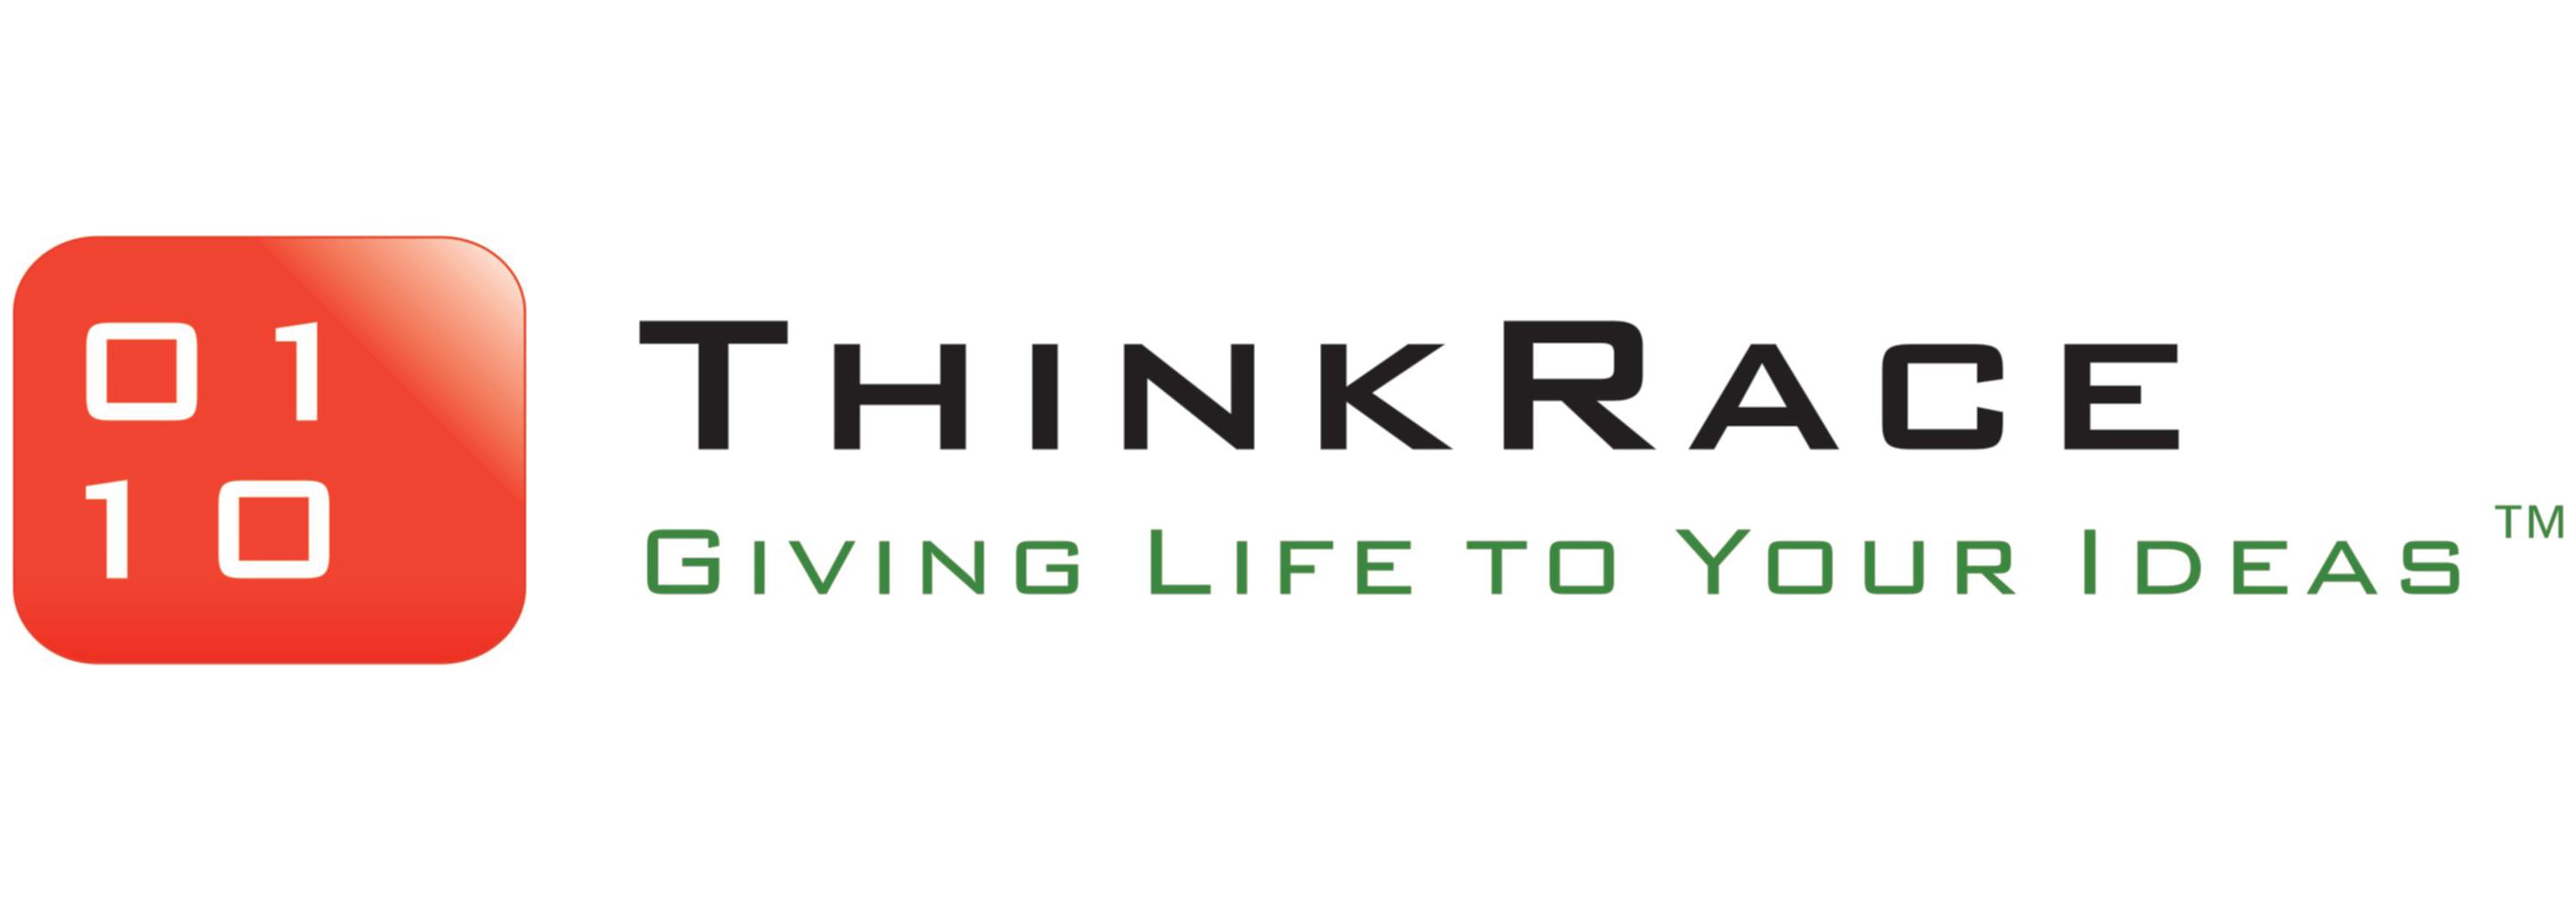 gps tracker thinkrace